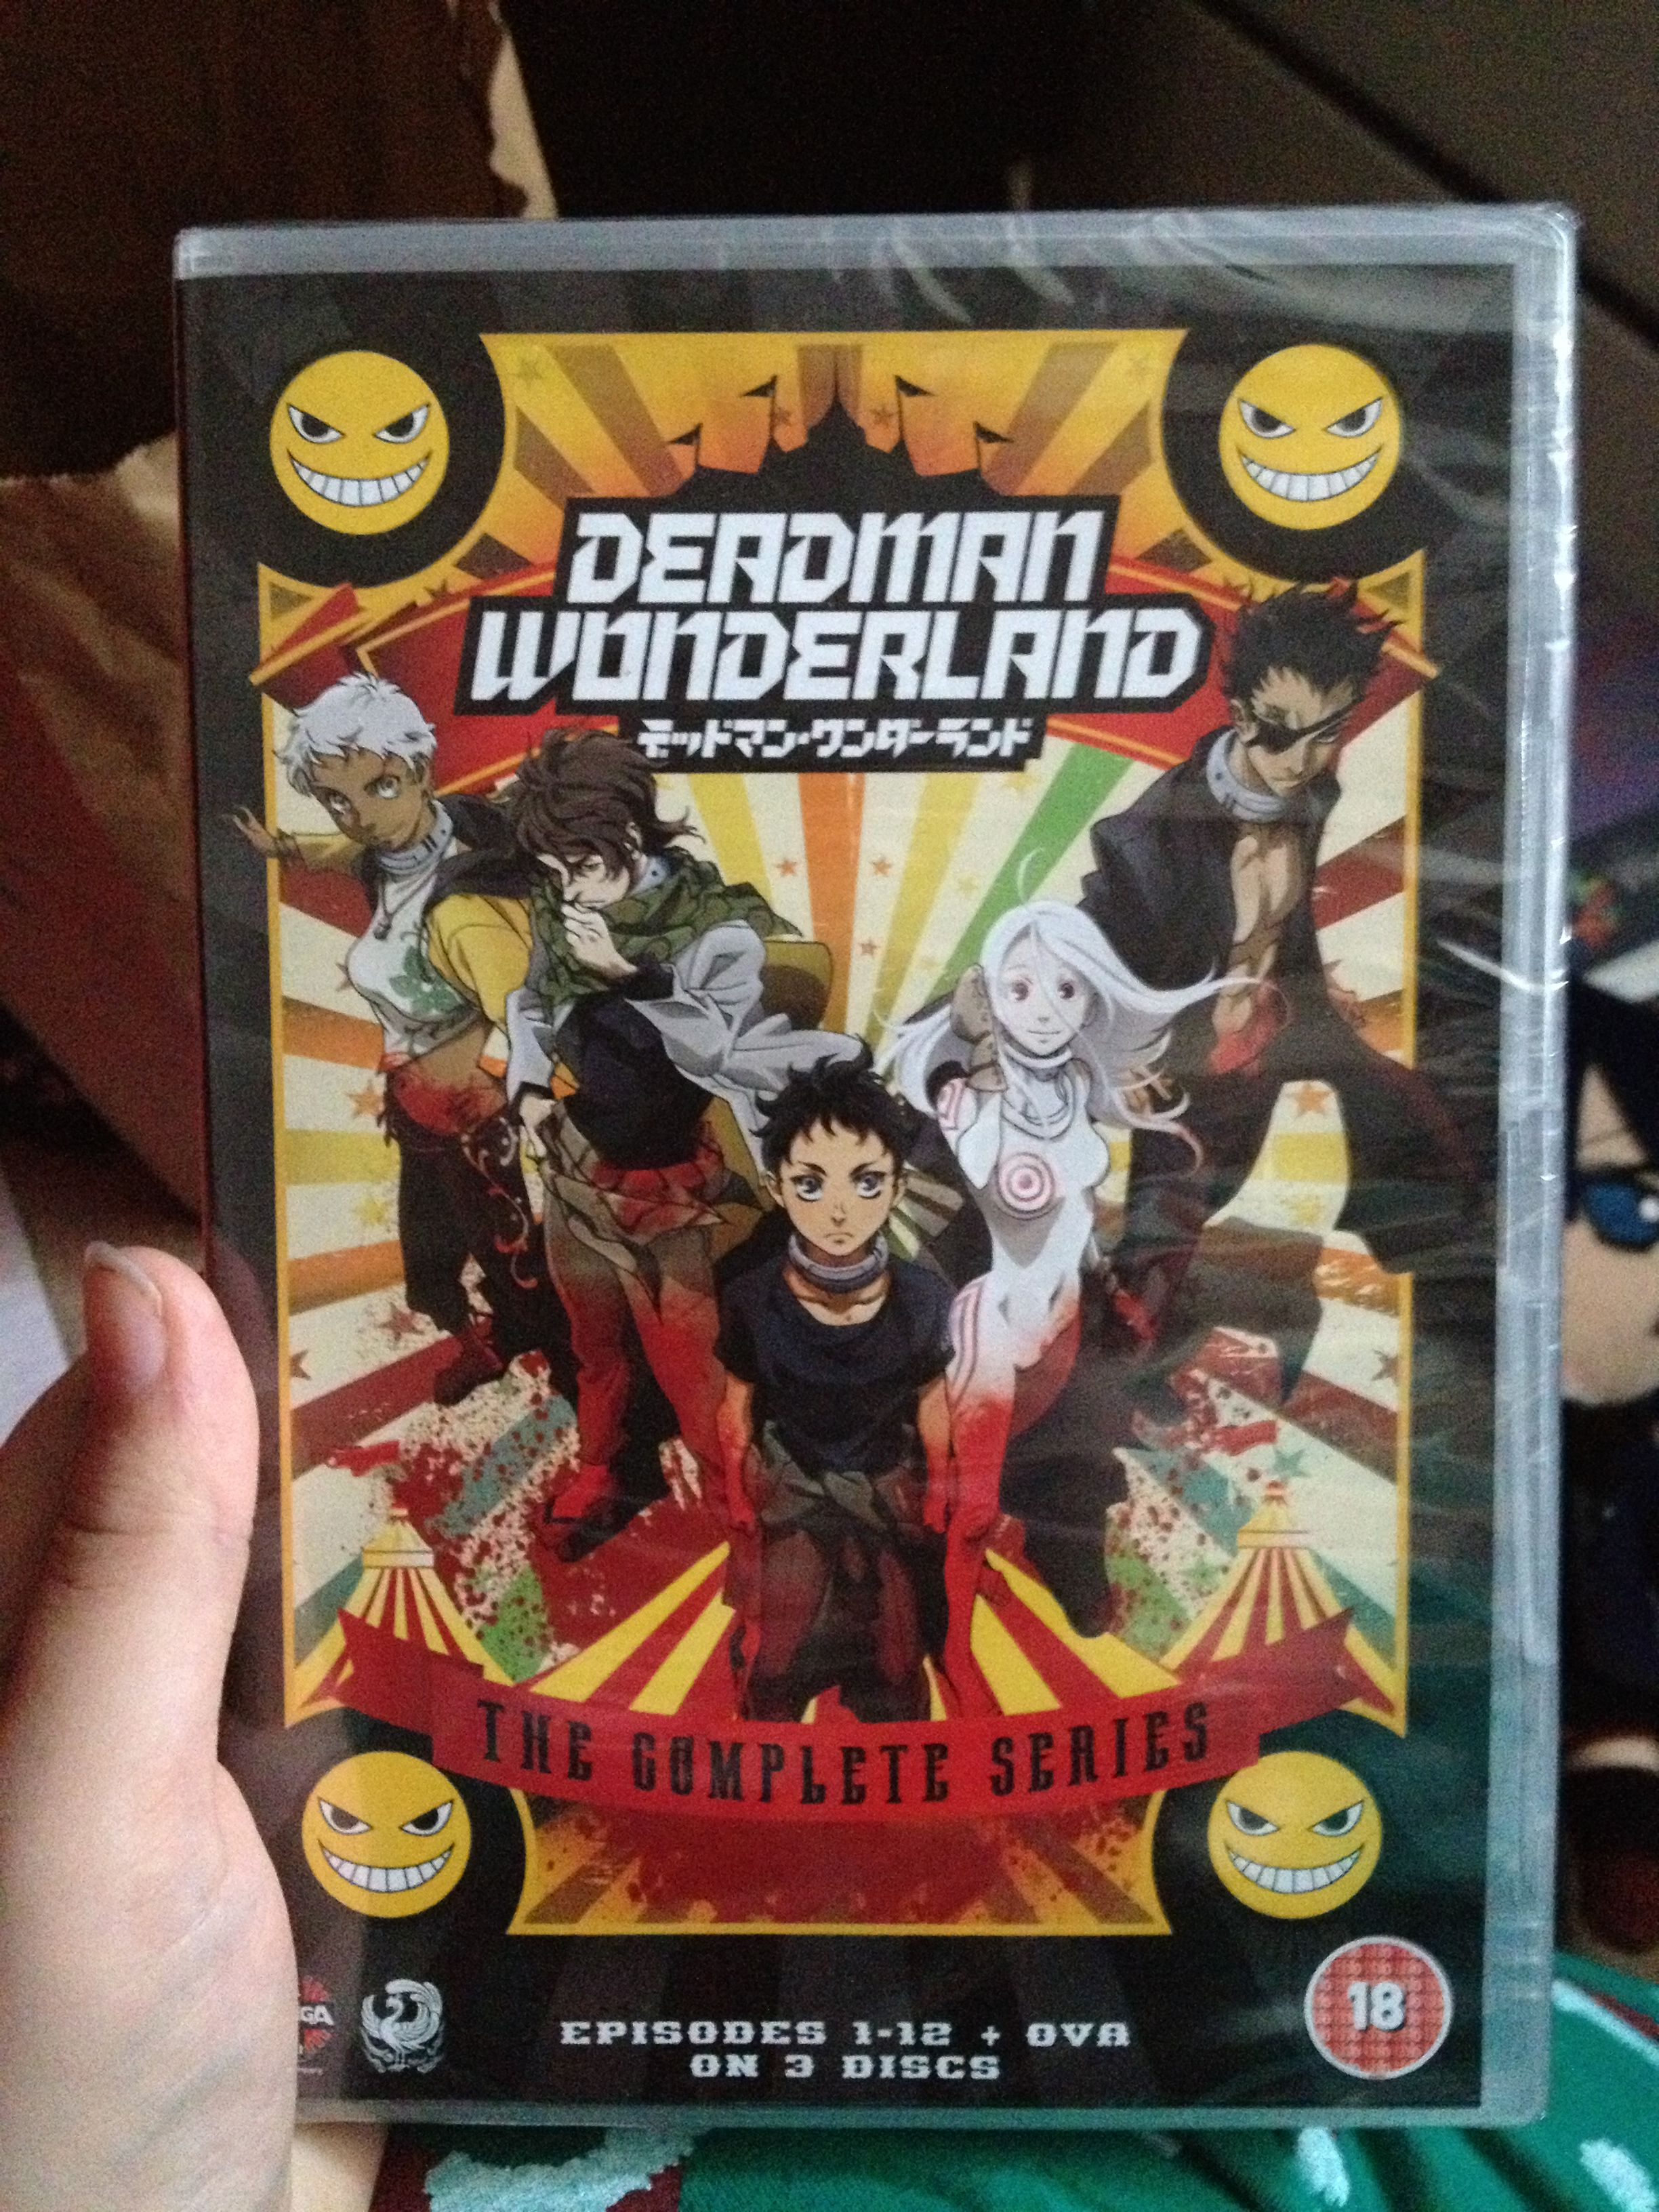 My boyfriend bought me the boxset of Deadman Wonderland